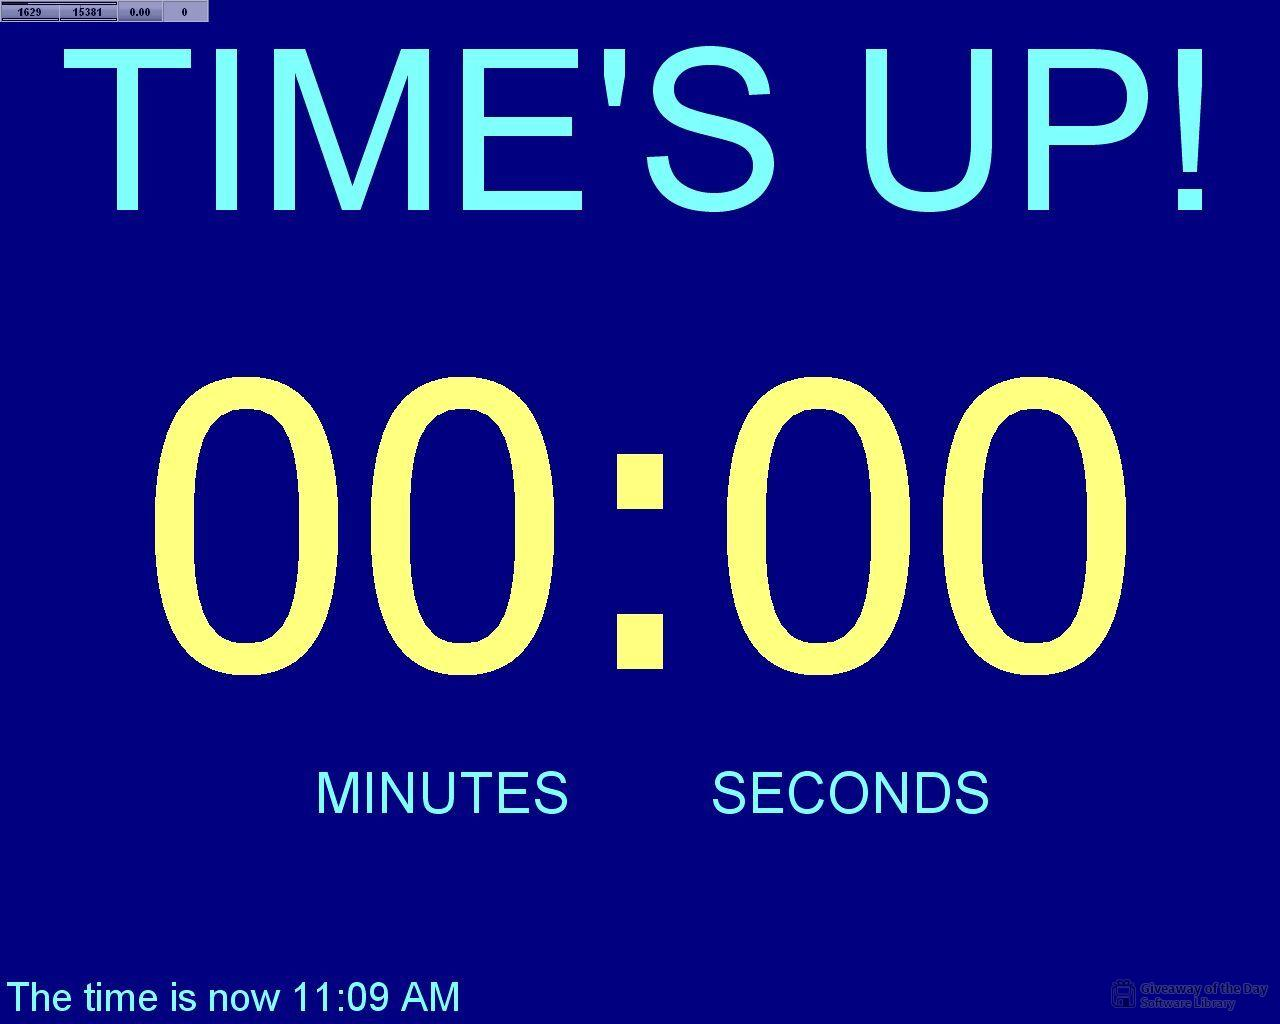 Desktop Timer Downloads Countdown Clock Alarm Timer Clock with 1280x1024